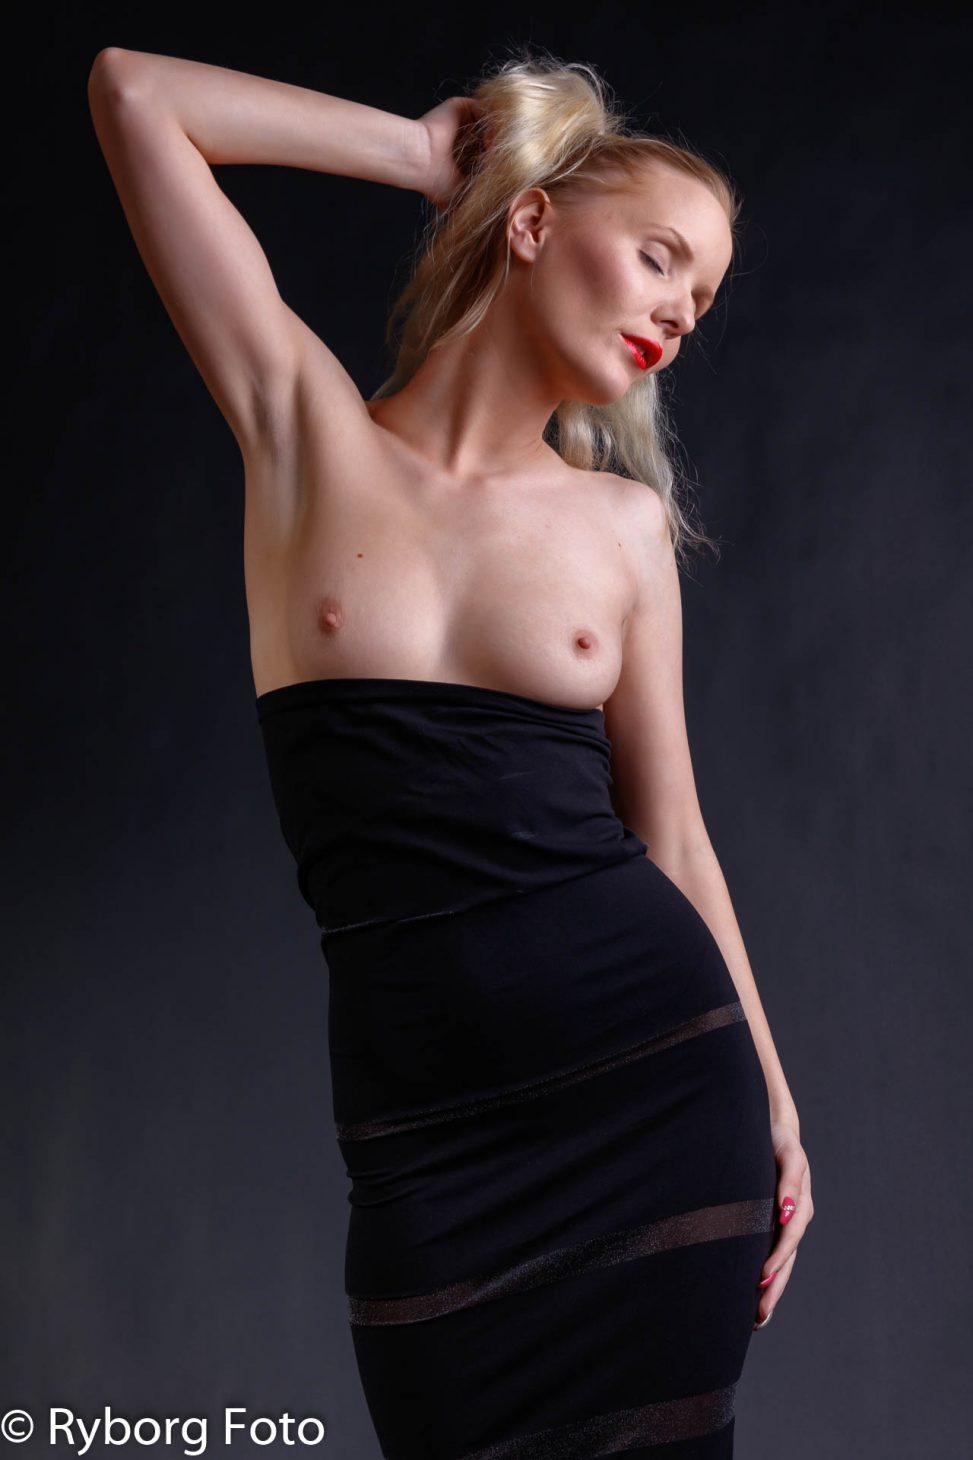 nicole brøggler topless black dress